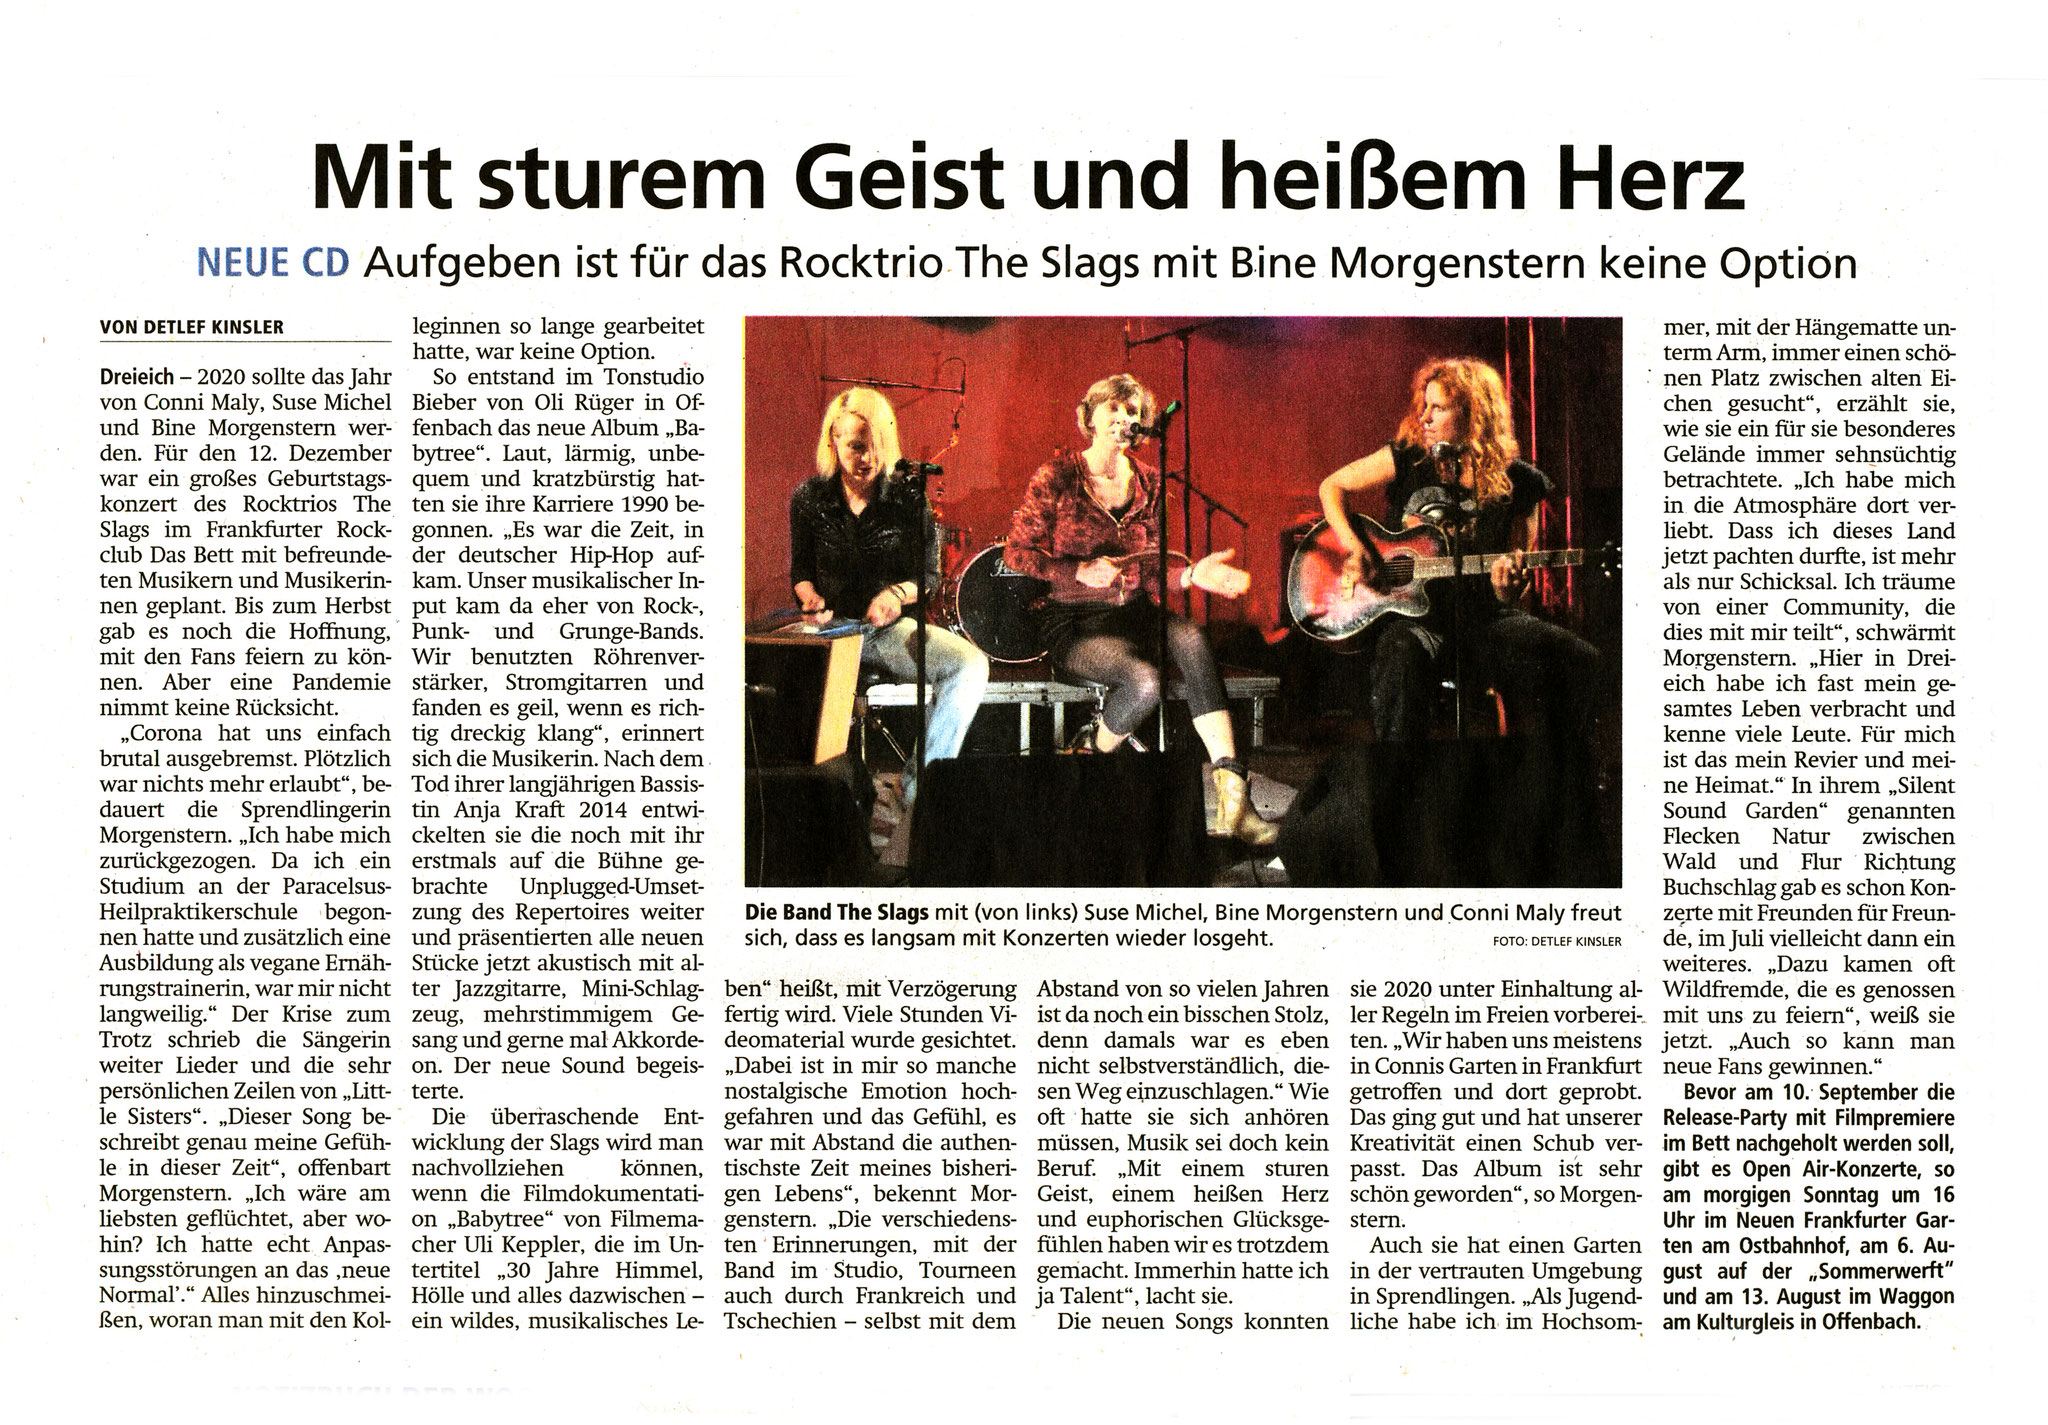 Offenbach Post, 3. Juli 2021